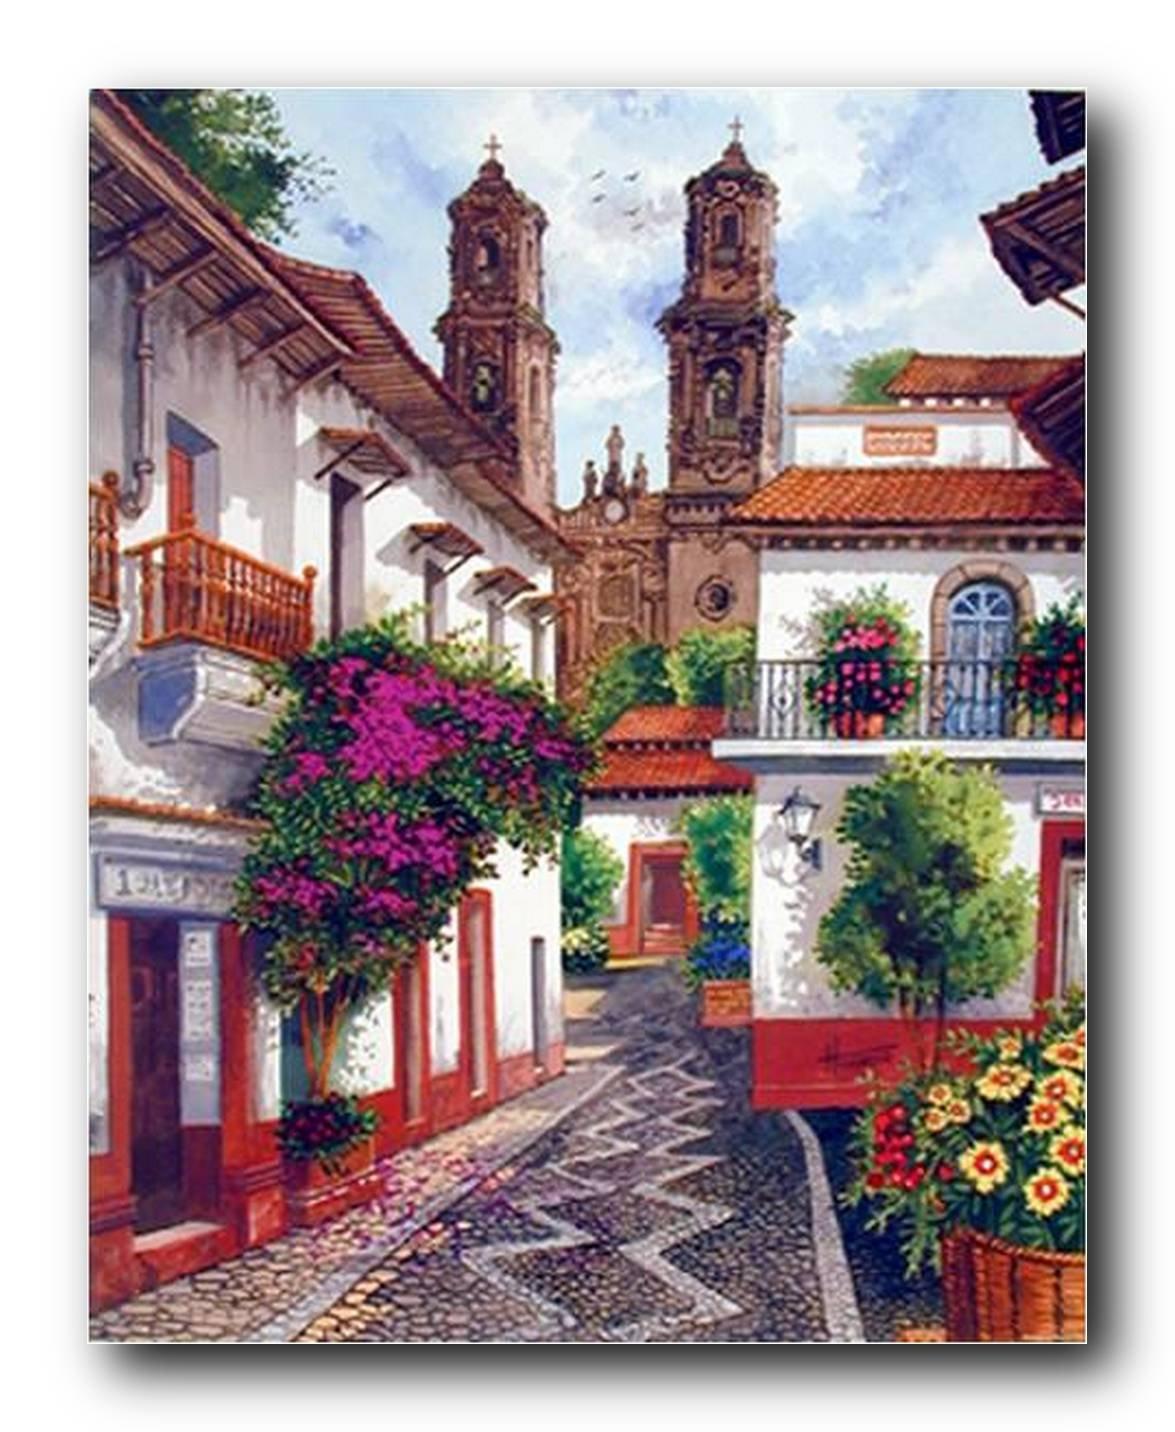 Old Mexico City Horacio Robles Jr Wall Decor Art Print Poster (16x20)